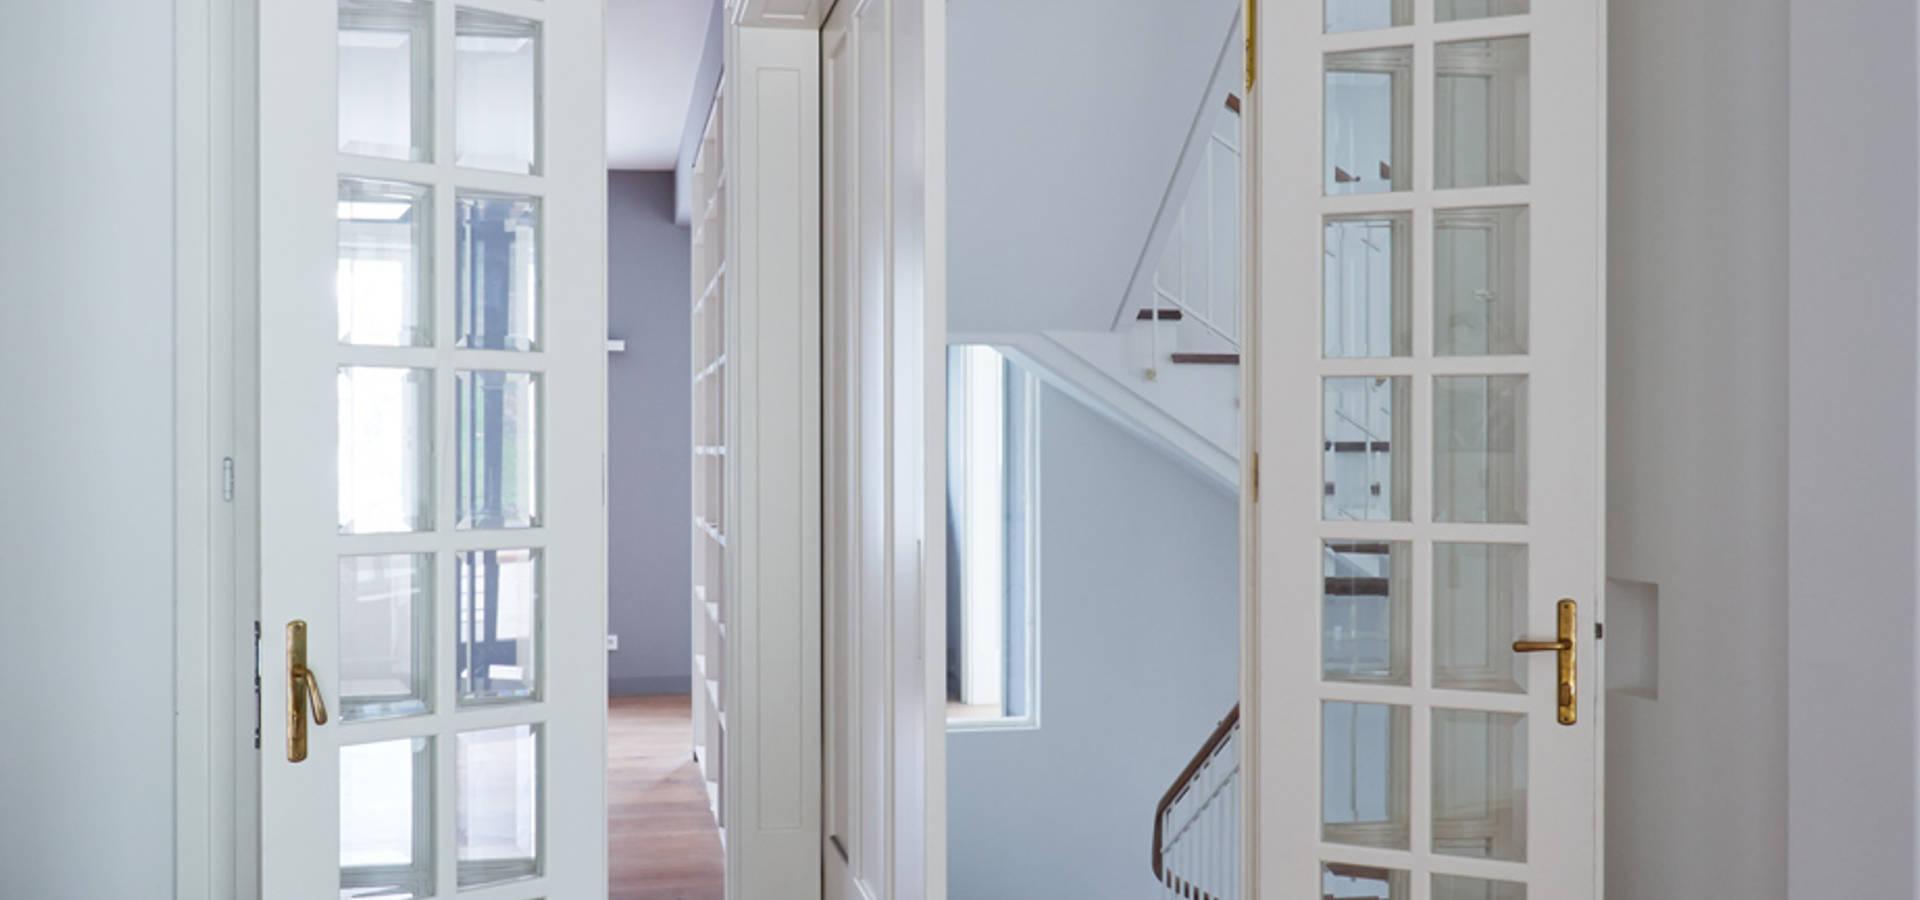 Stil-Villa in Döbling von Mayr & Glatzl Innenarchitektur Gmbh | homify